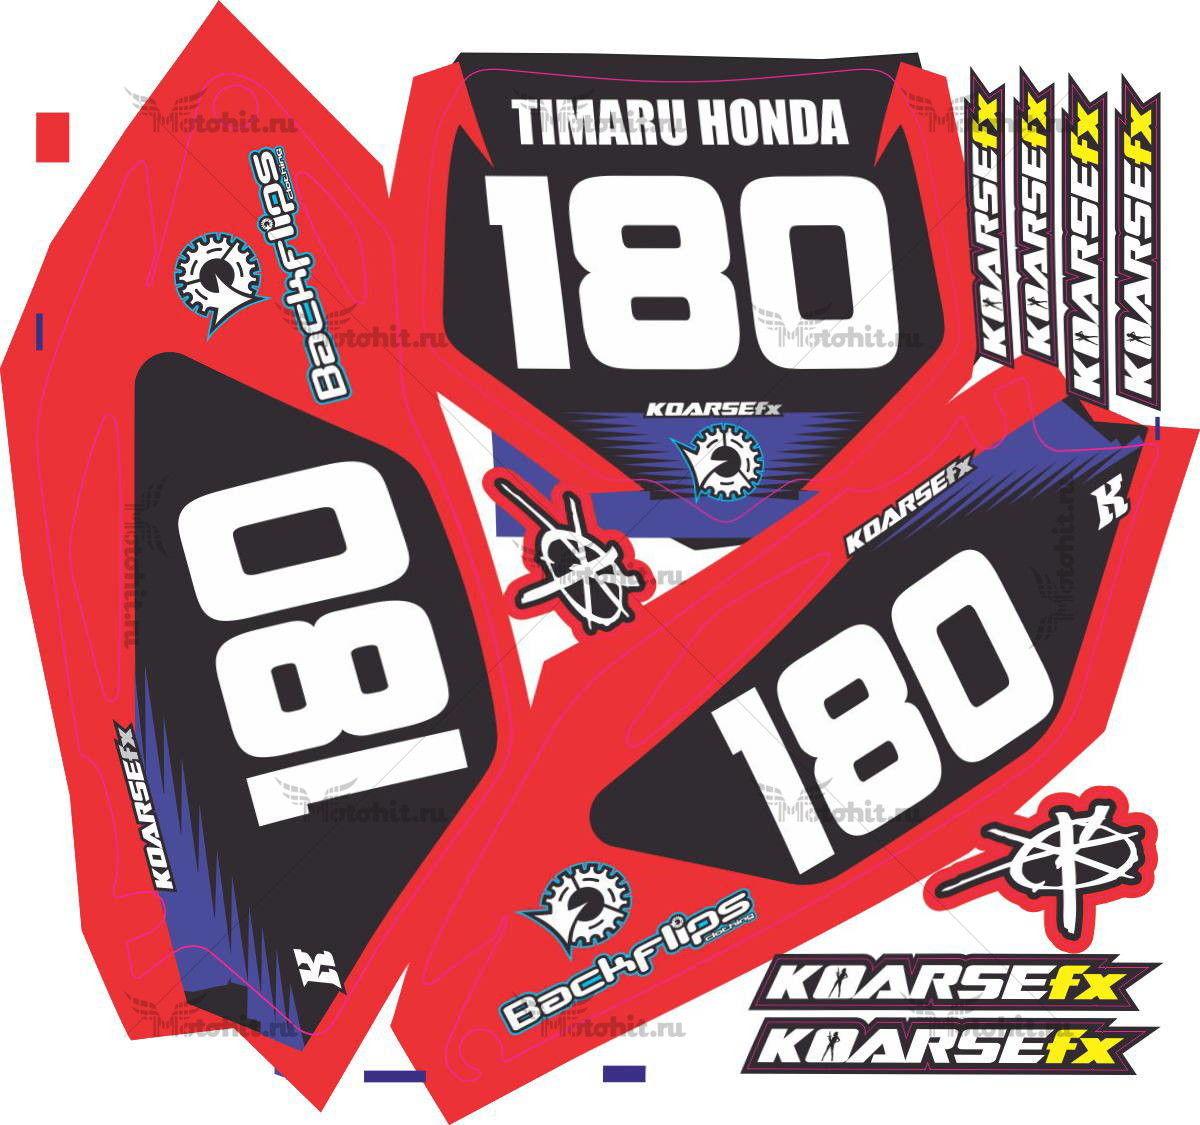 Комплект наклеек Honda CRF-250 CRF-450 2012 TIMARU